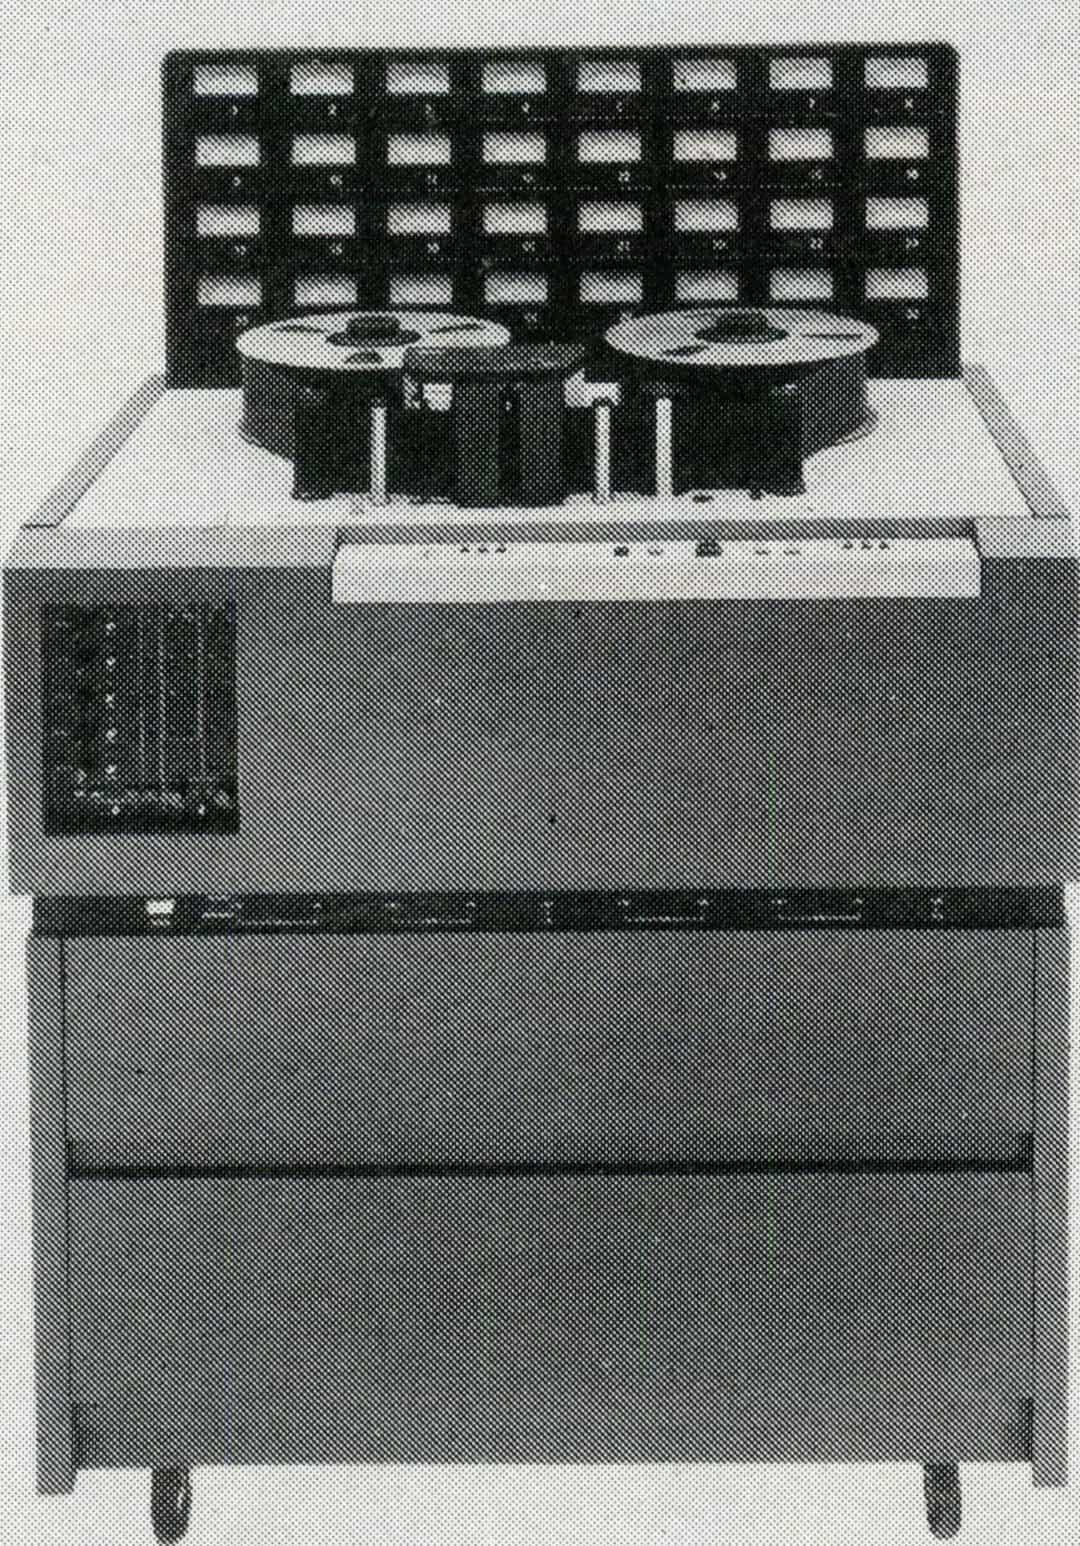 MCI JH32 3 inch 32 track Tape Recorder